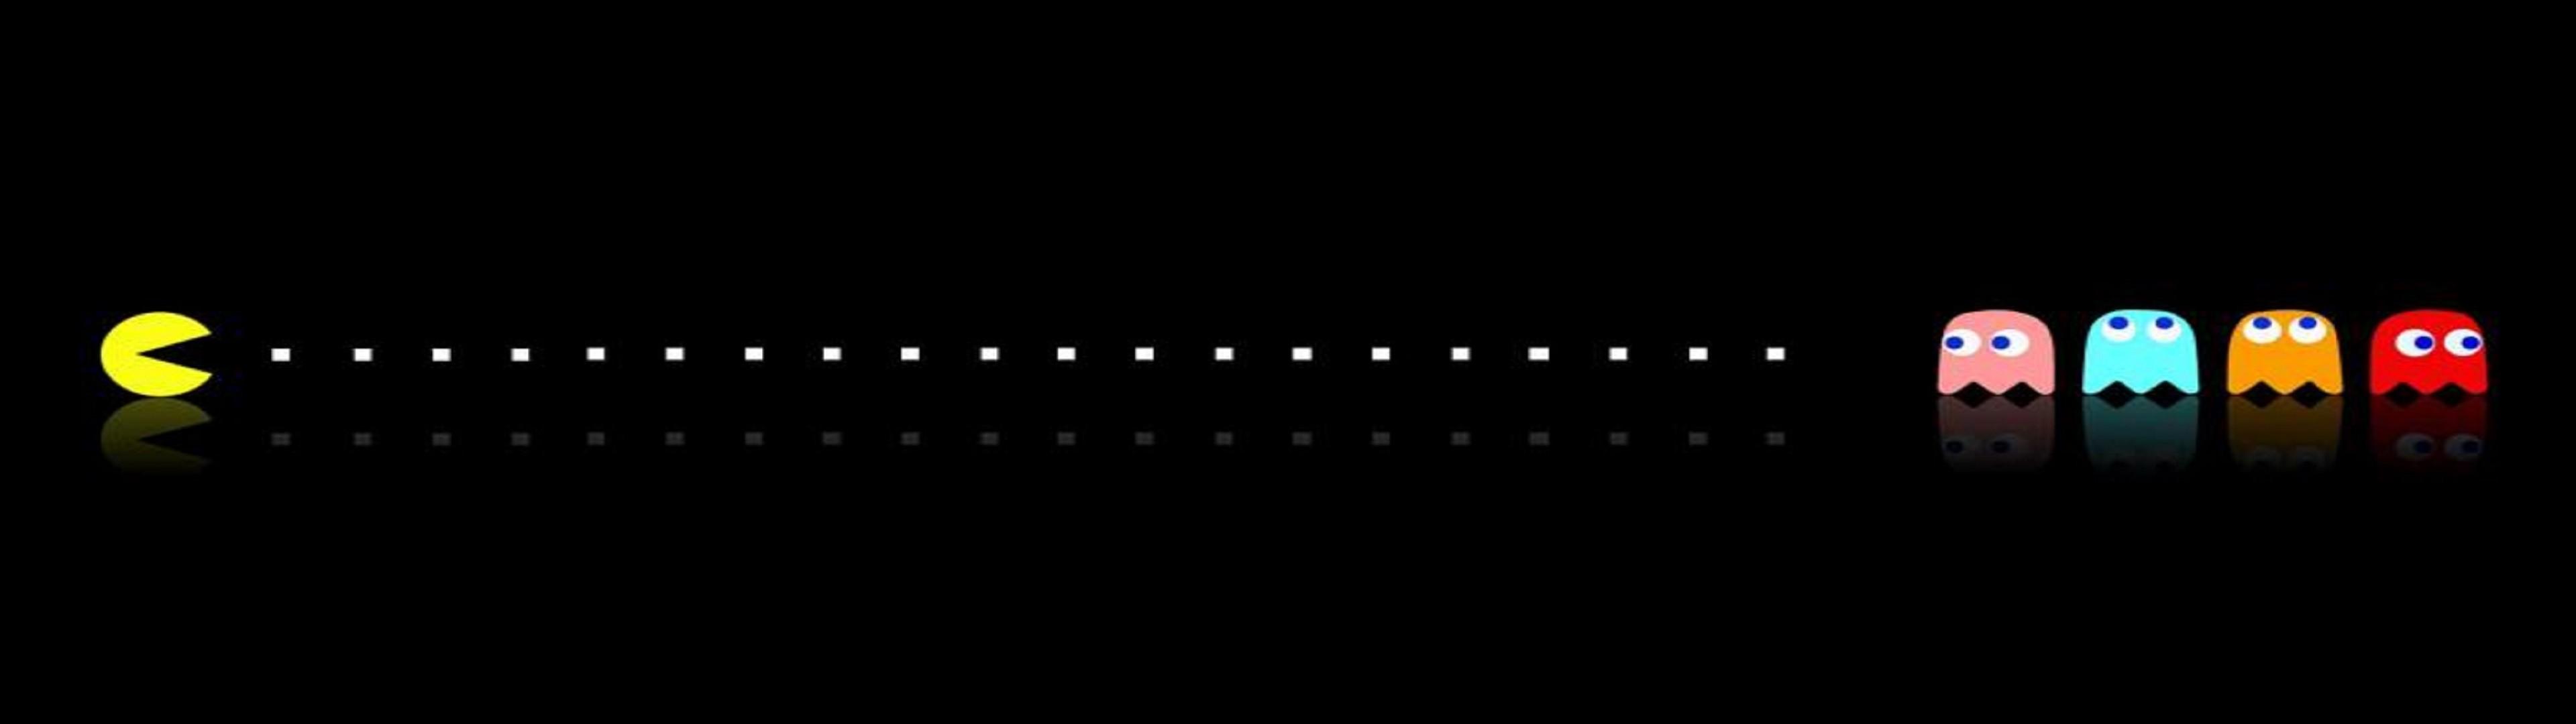 Pac Man Dual Monitor Wallpaper 3840×1080